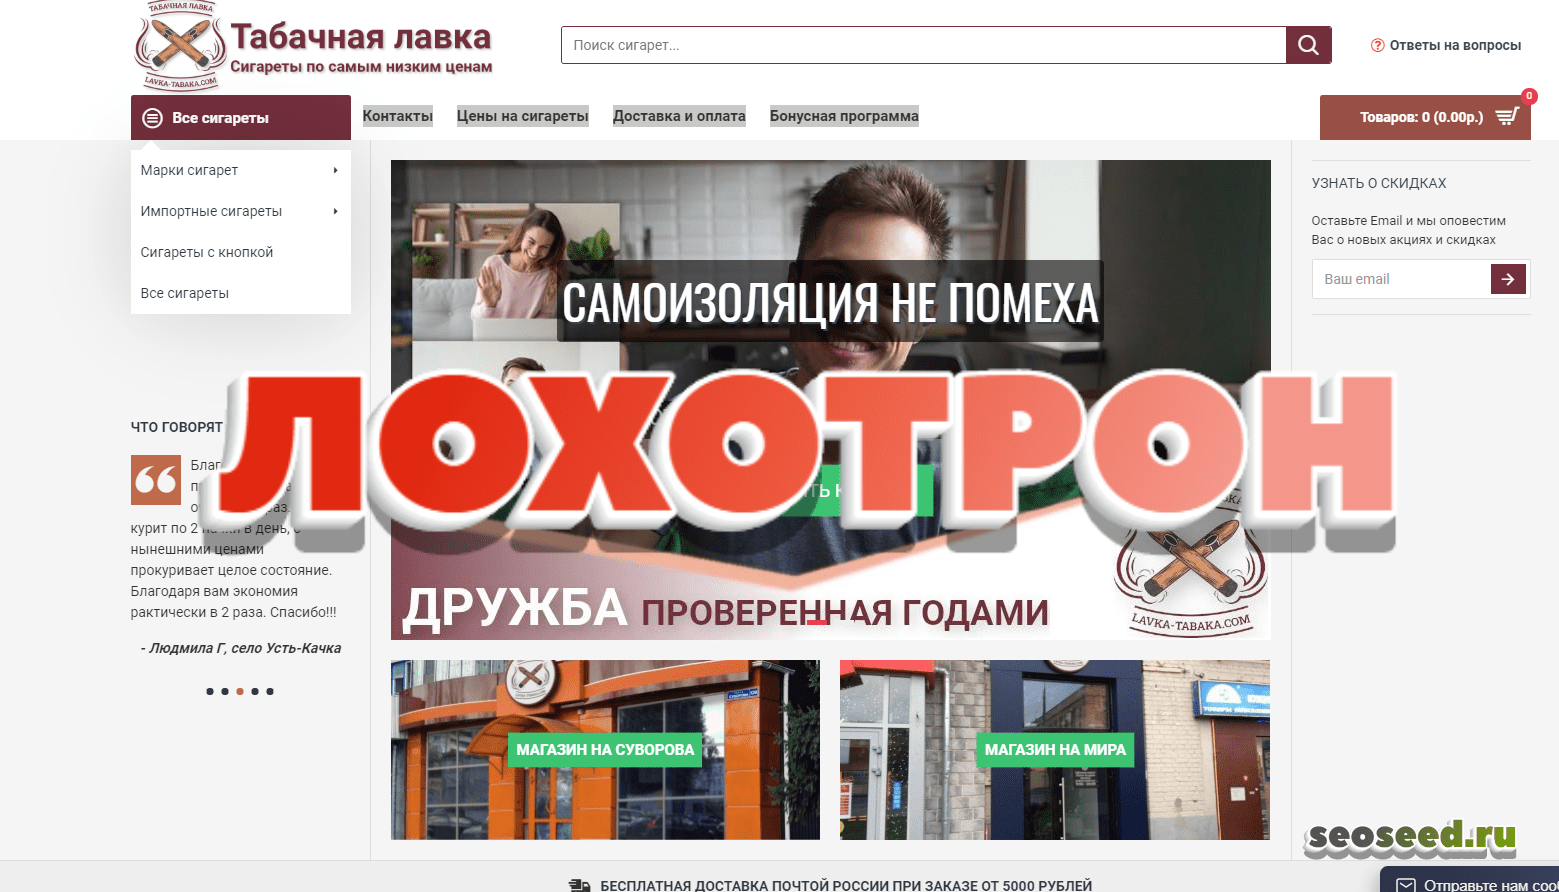 Lavkatabaka.com - обзор и отзывы интернет-магазина дешевого табака